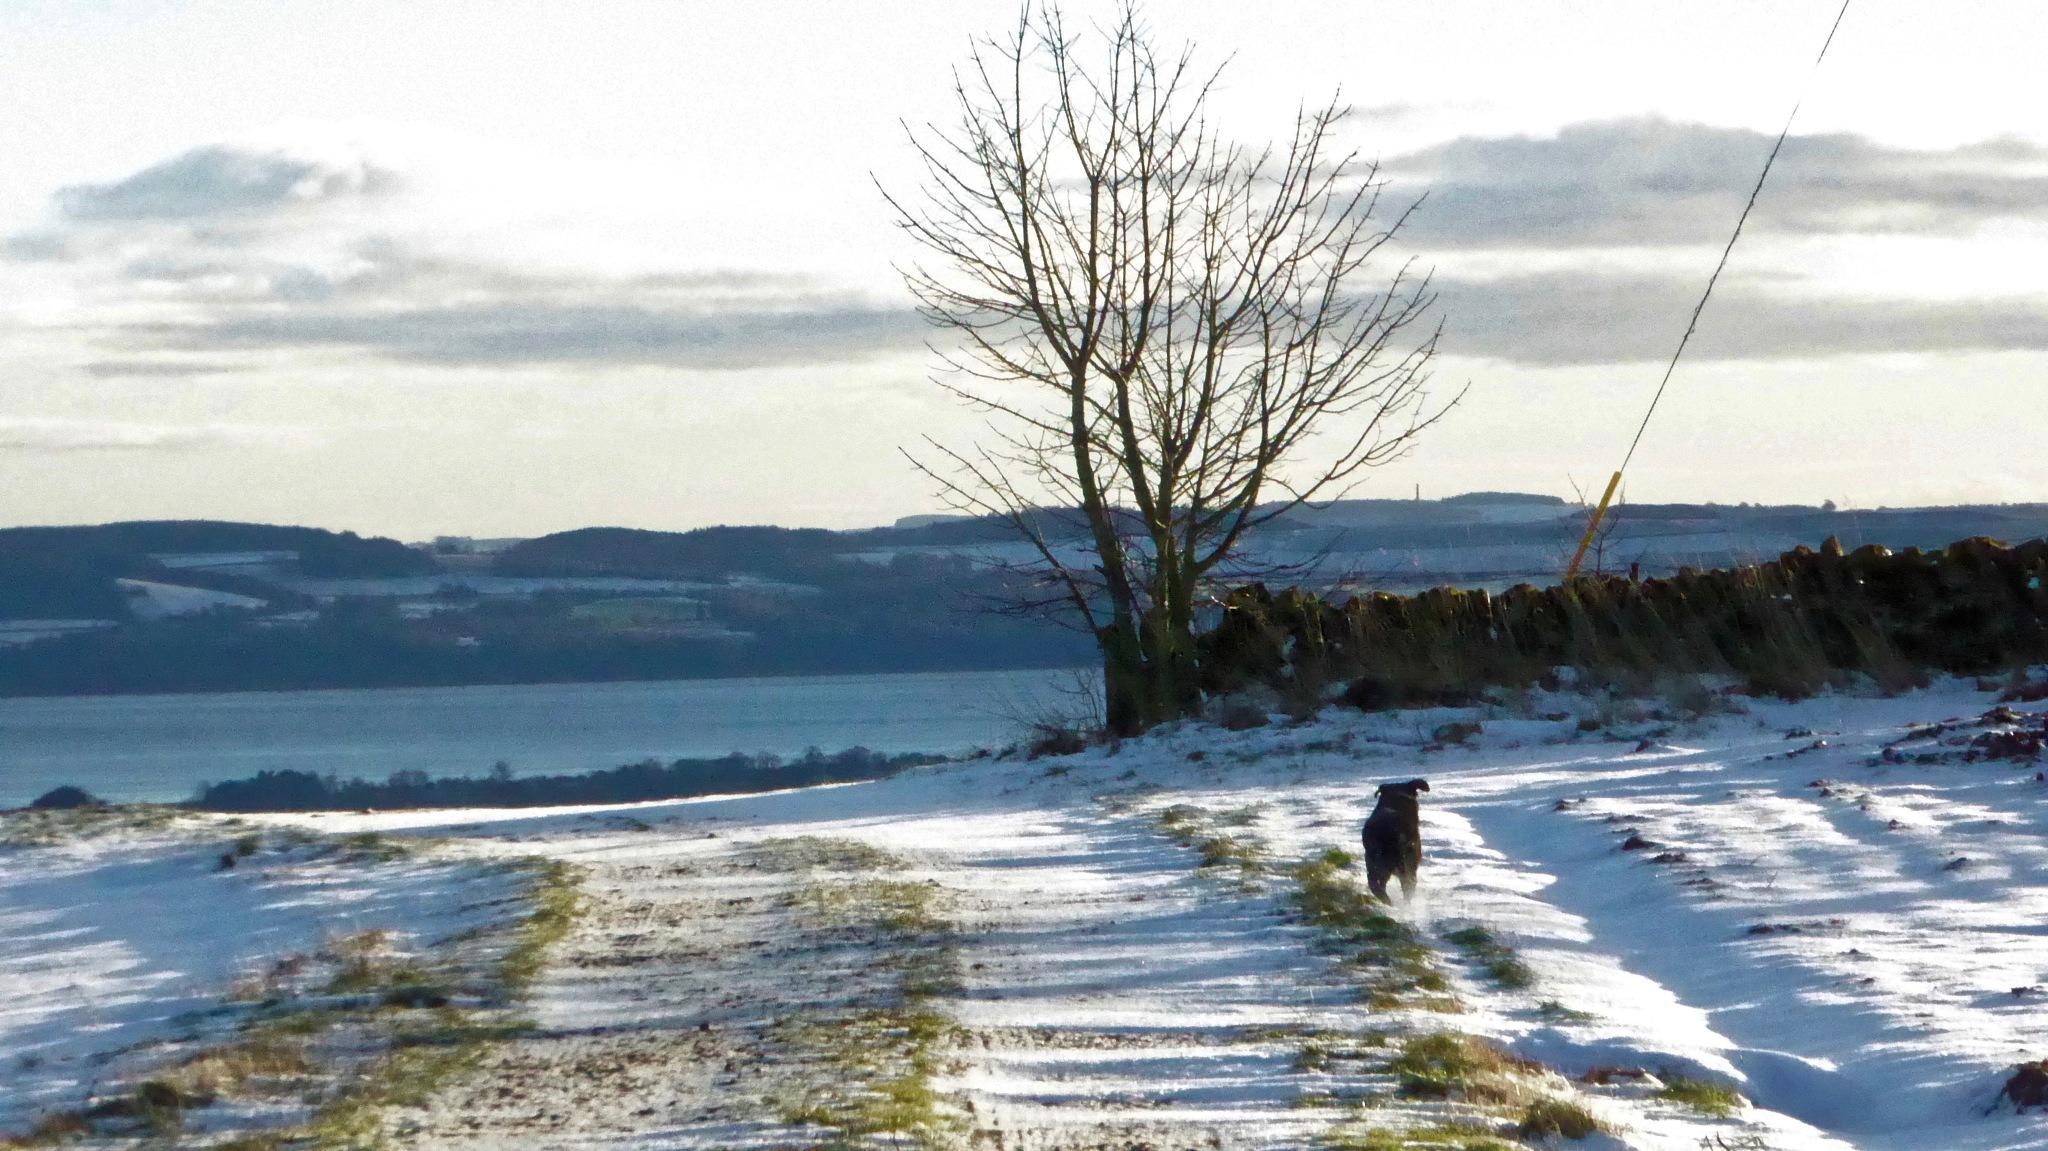 Branna's winter romp by Nick Birch